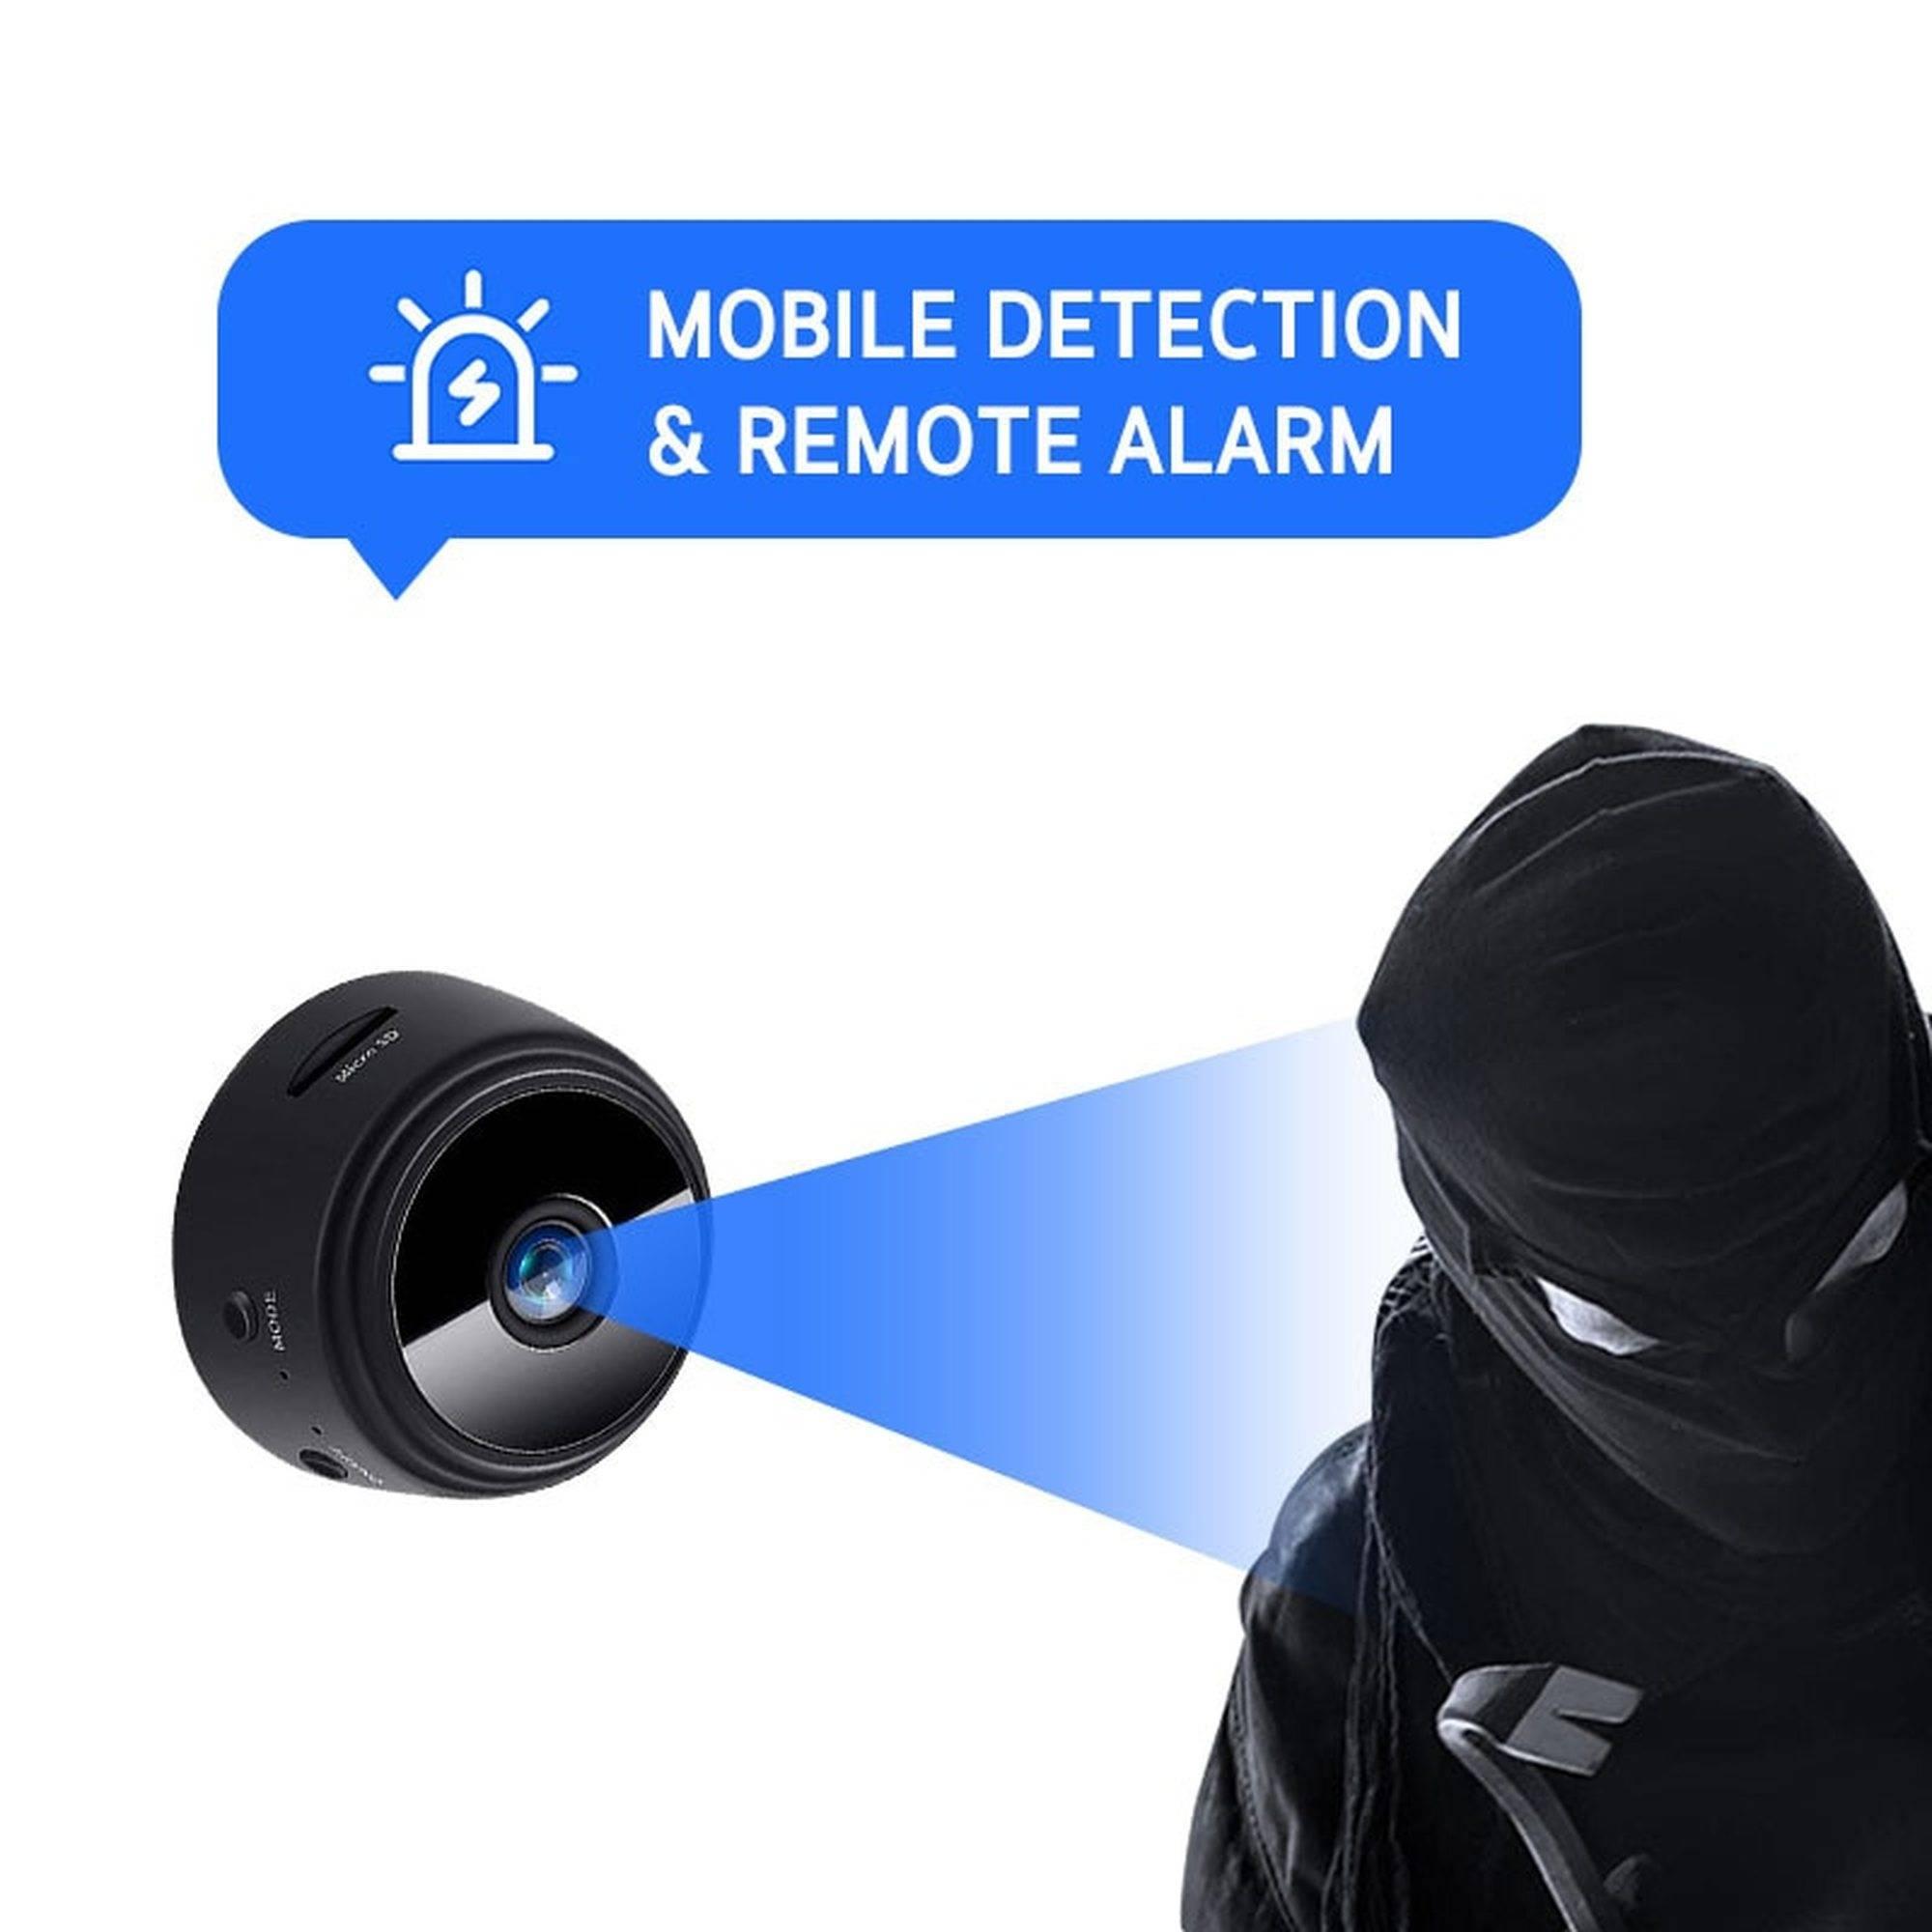 Wireless Wifi Camera With Sensori Night Vision - THE GOLD DEAL